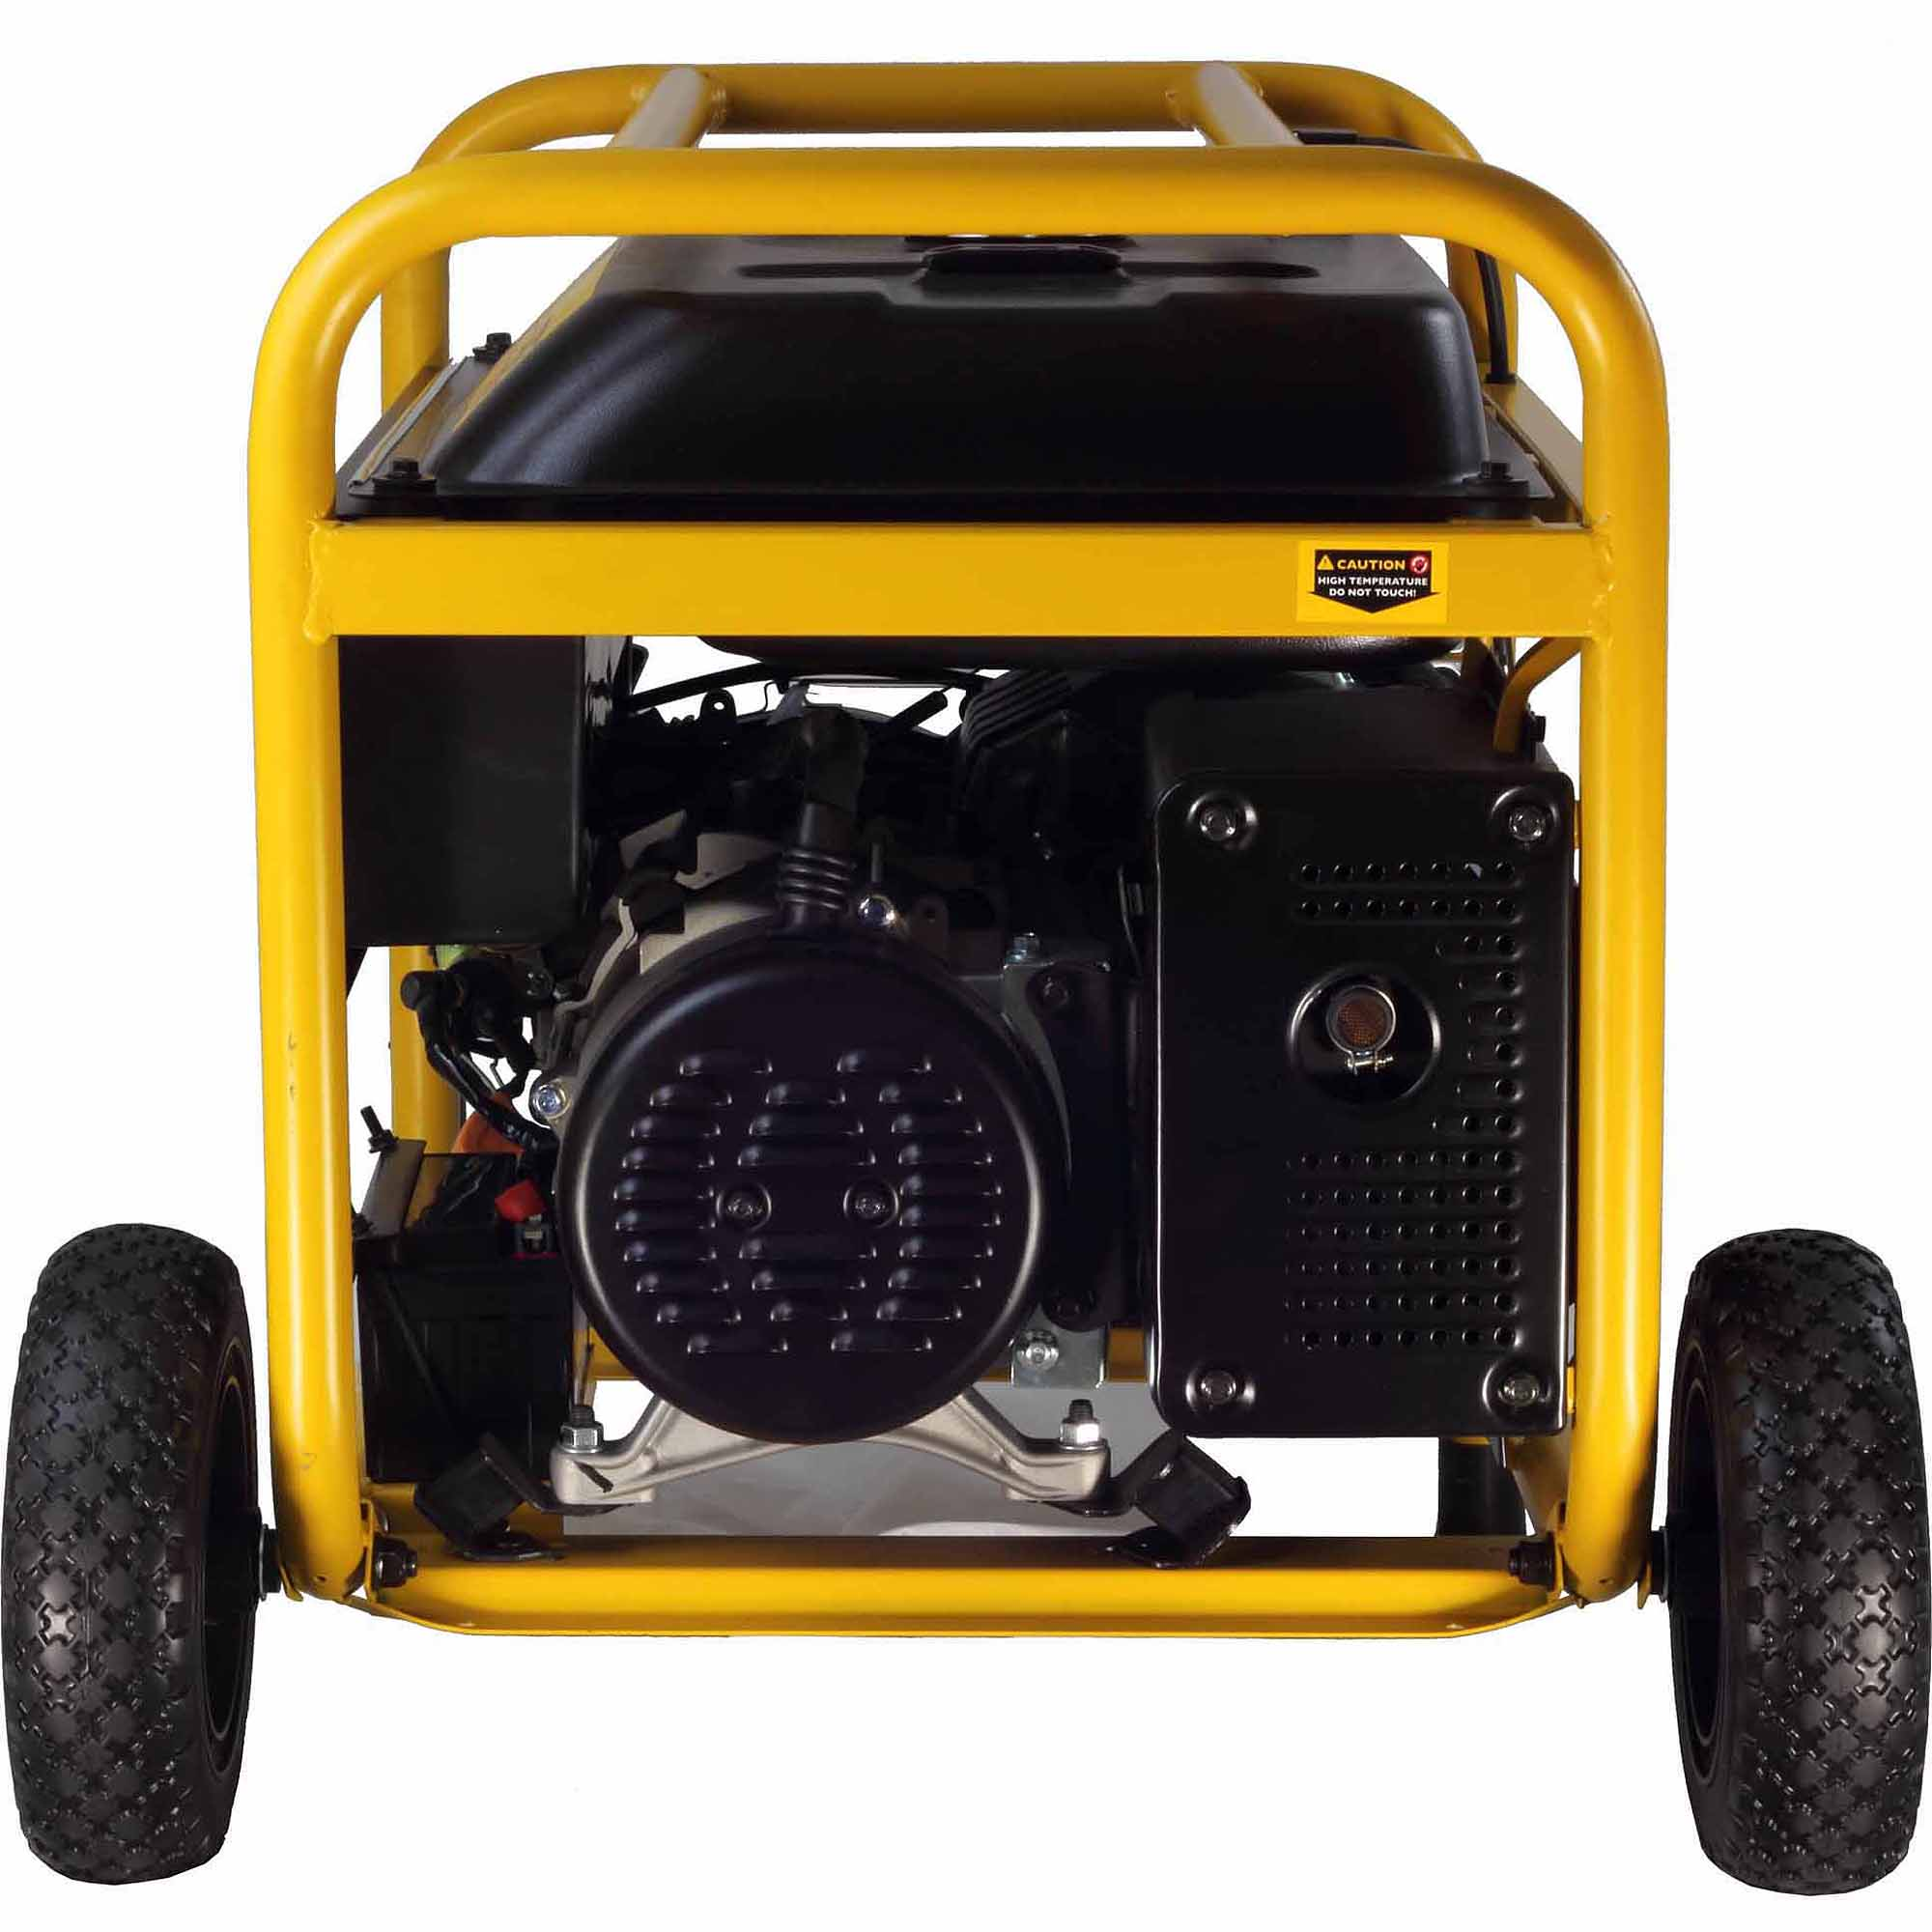 Manual start generac generator